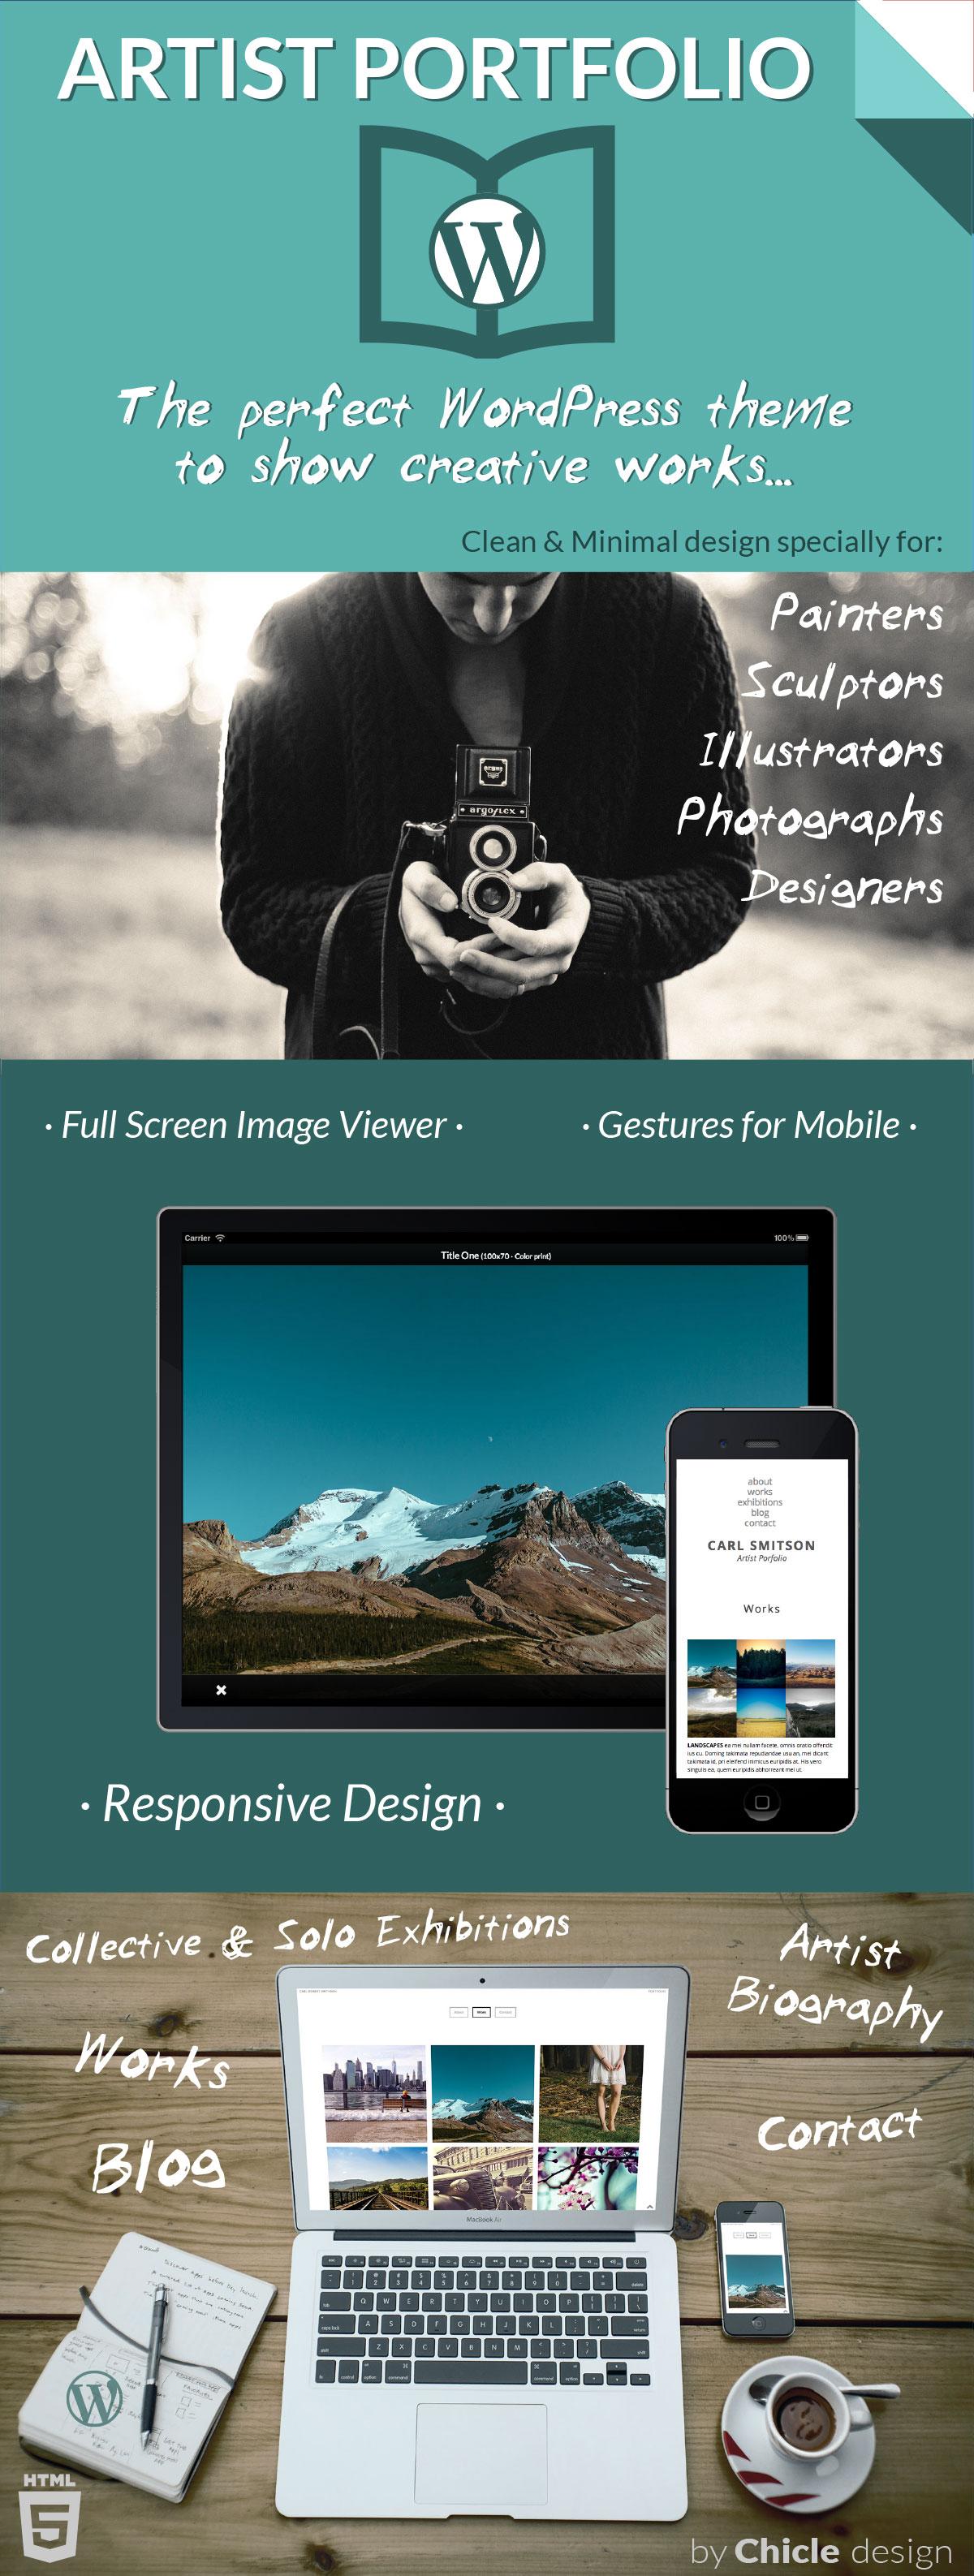 Artist_Portfolio-Features.jpg